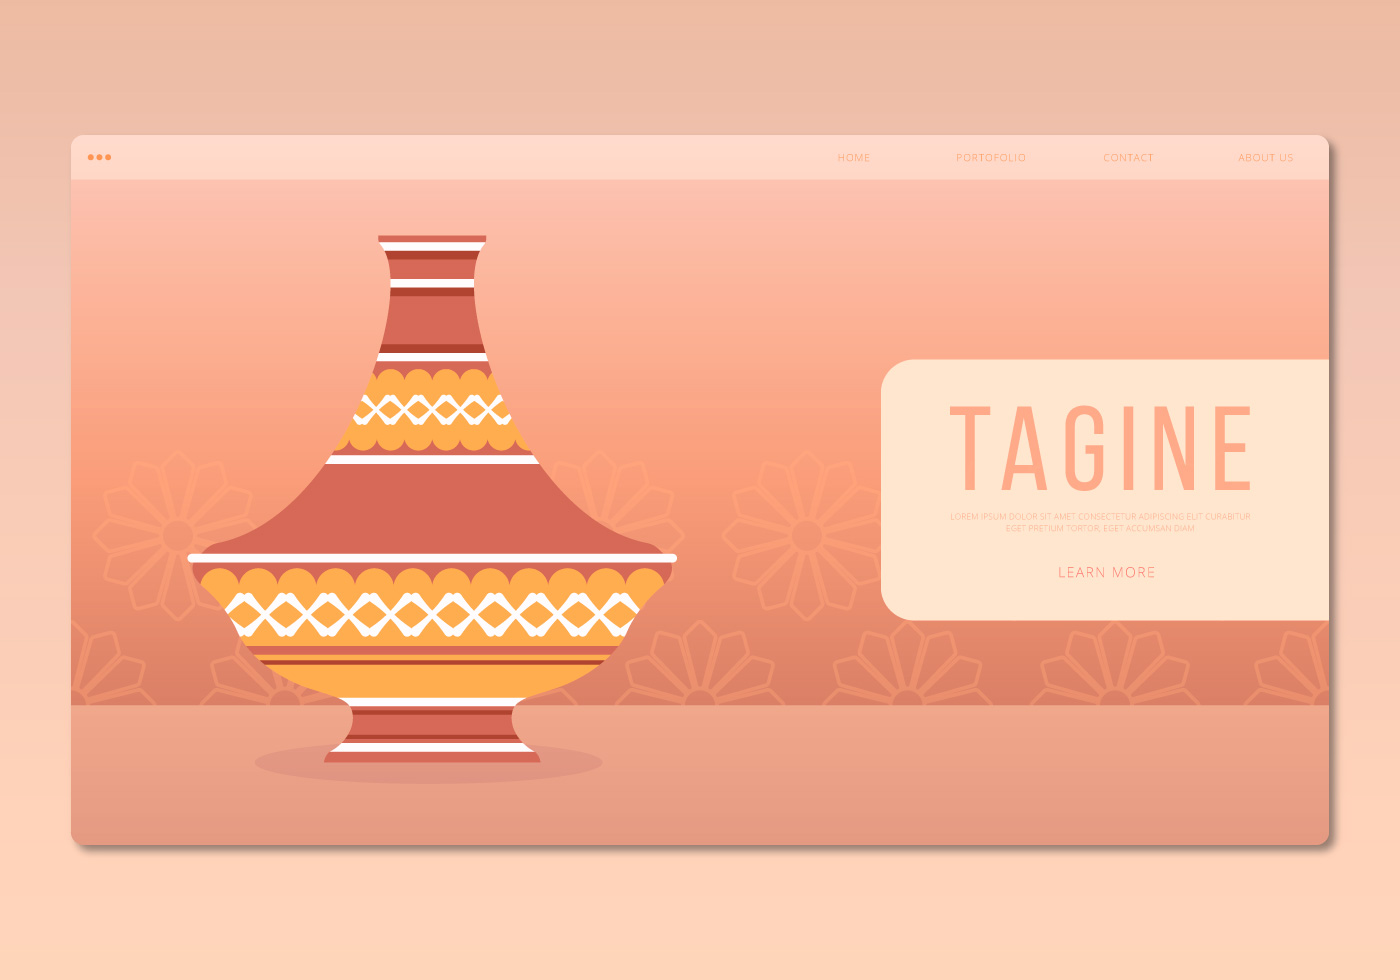 Vector Illustration Web Designs: Tajine Moroccan Traditional Food Illustration. Web